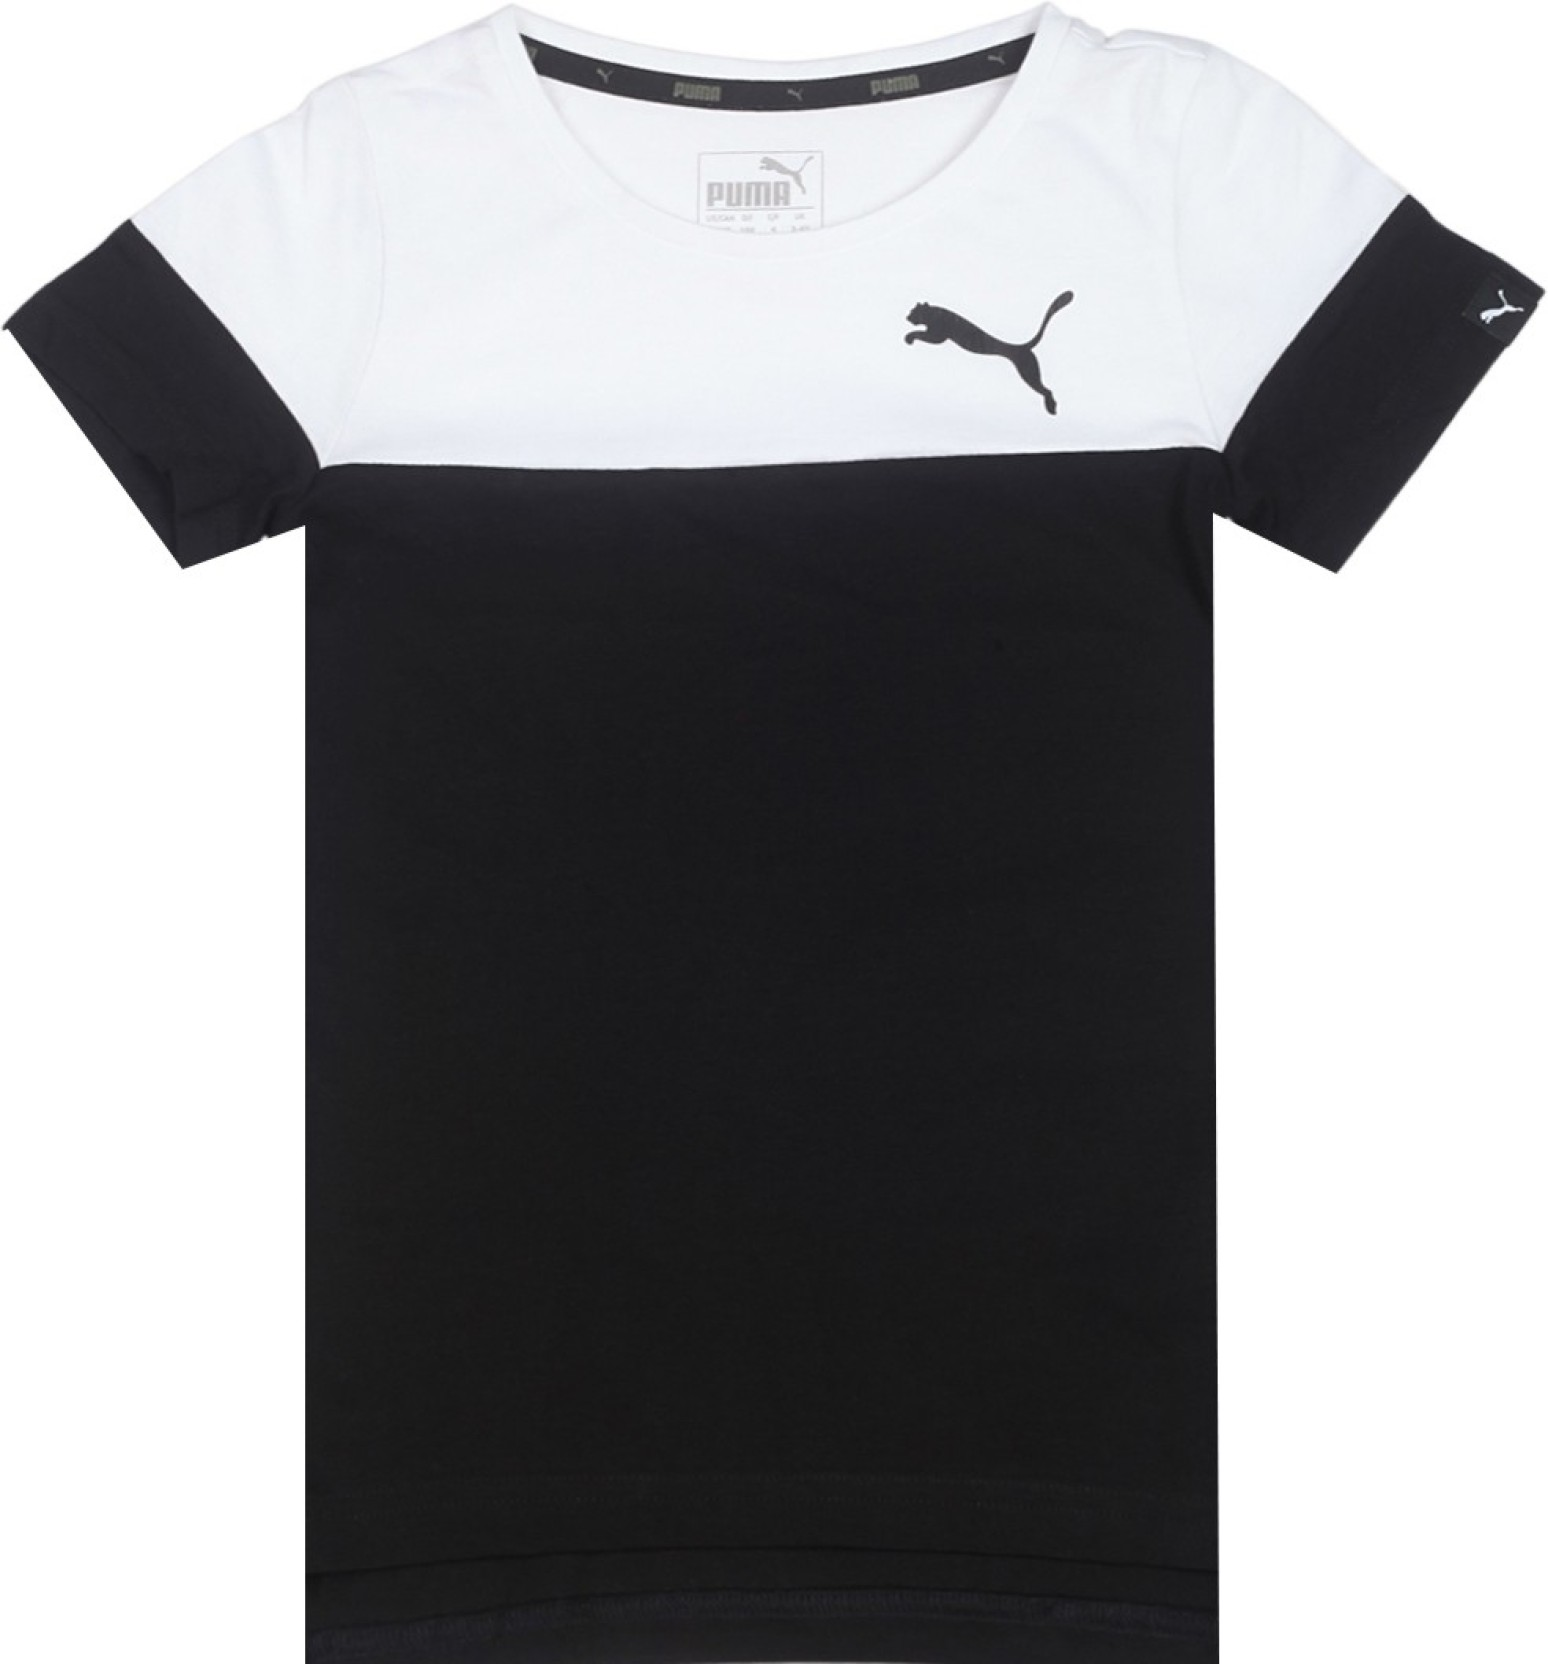 ad922f415ab0 Puma Boys Solid Cotton T Shirt Price in India - Buy Puma Boys Solid ...